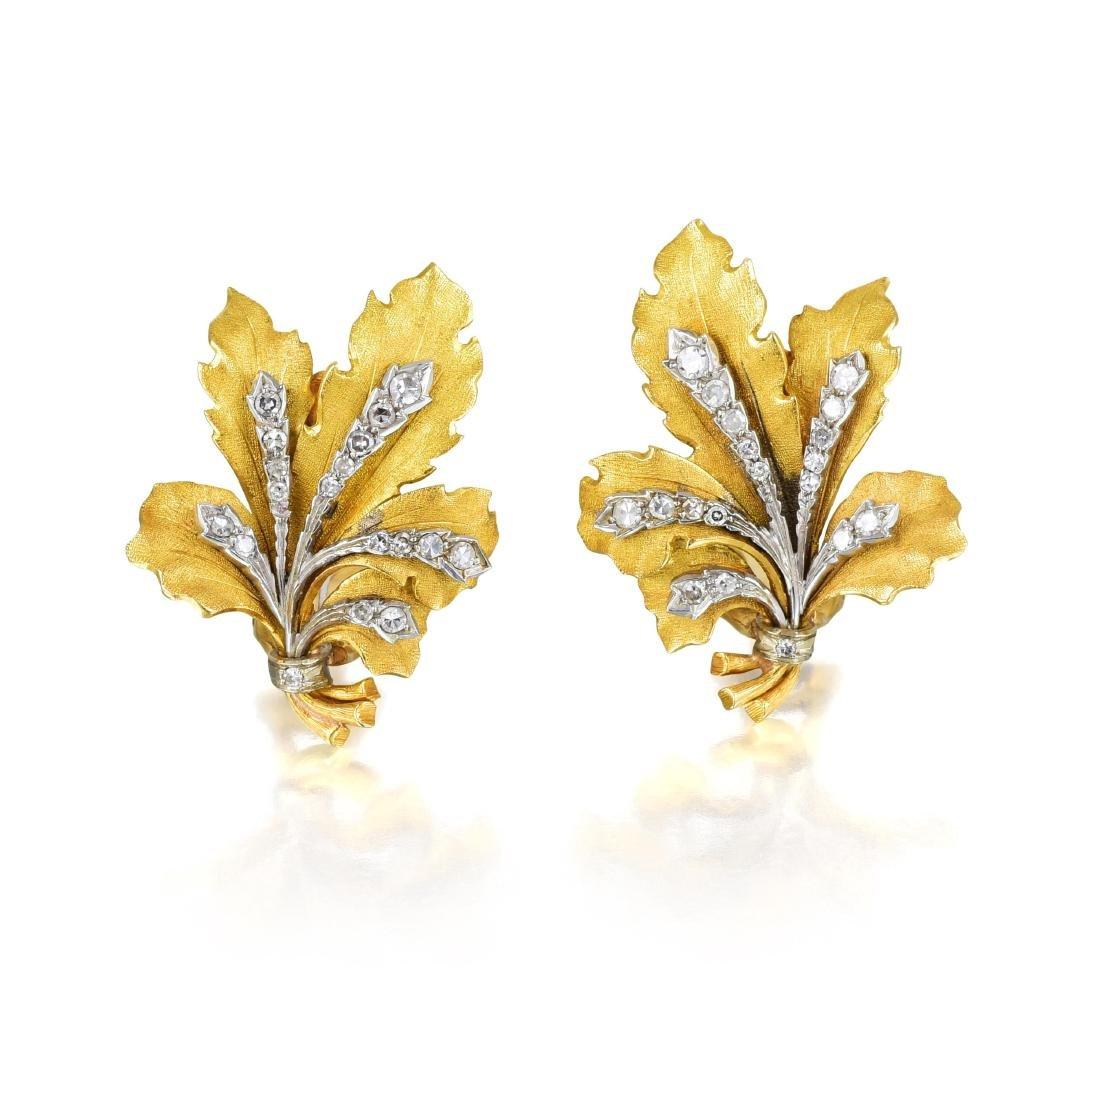 Buccellati Diamond and Gold Leaf Earrings